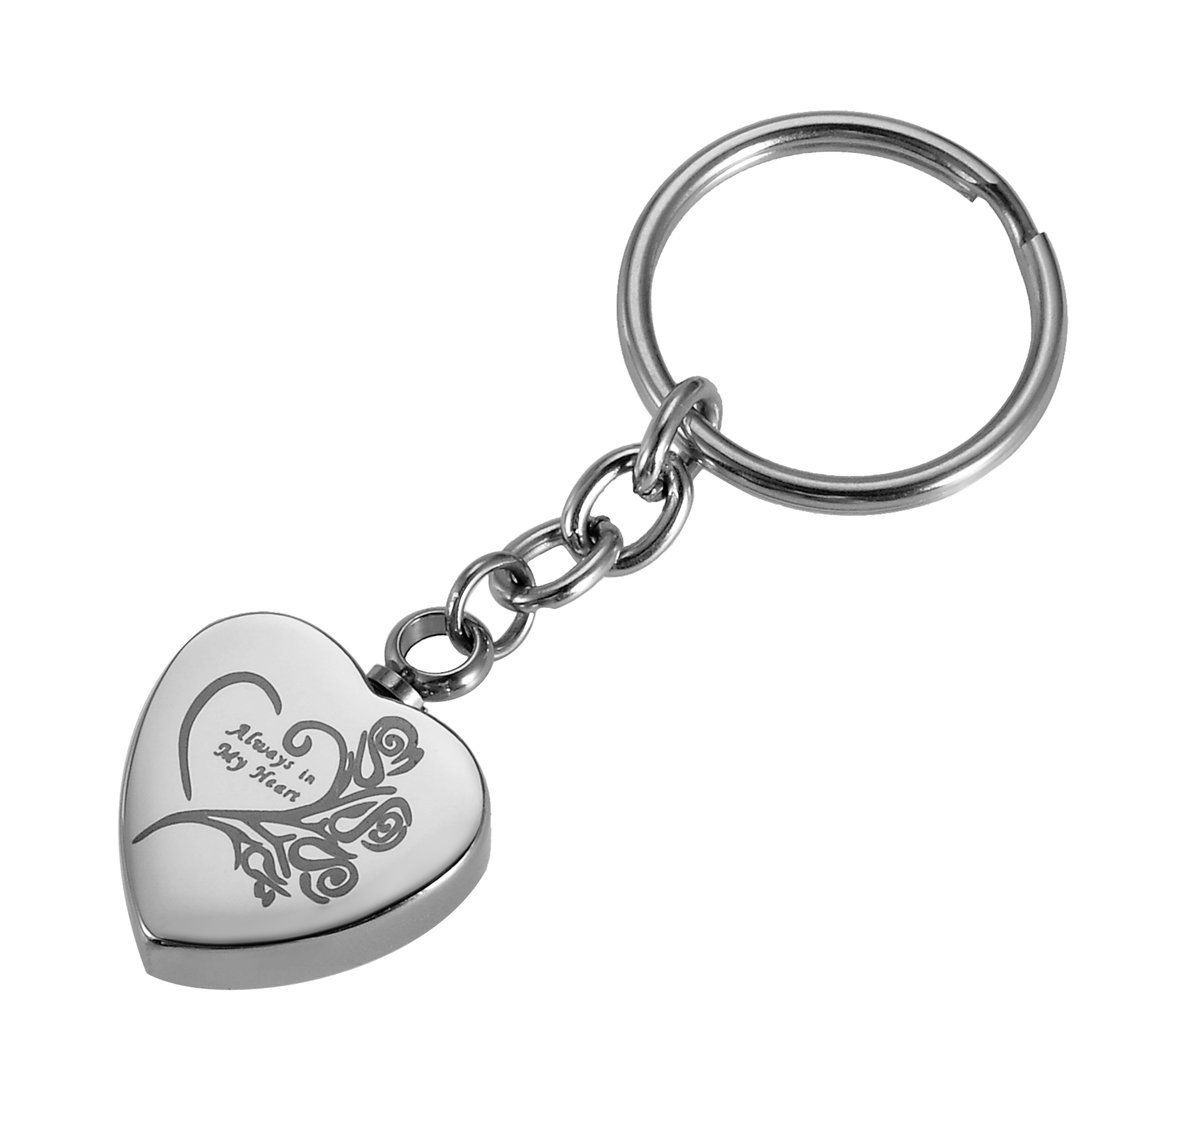 Cremation Keepsake Memorial Keychain Urn Silver w// Wing Heart Charm